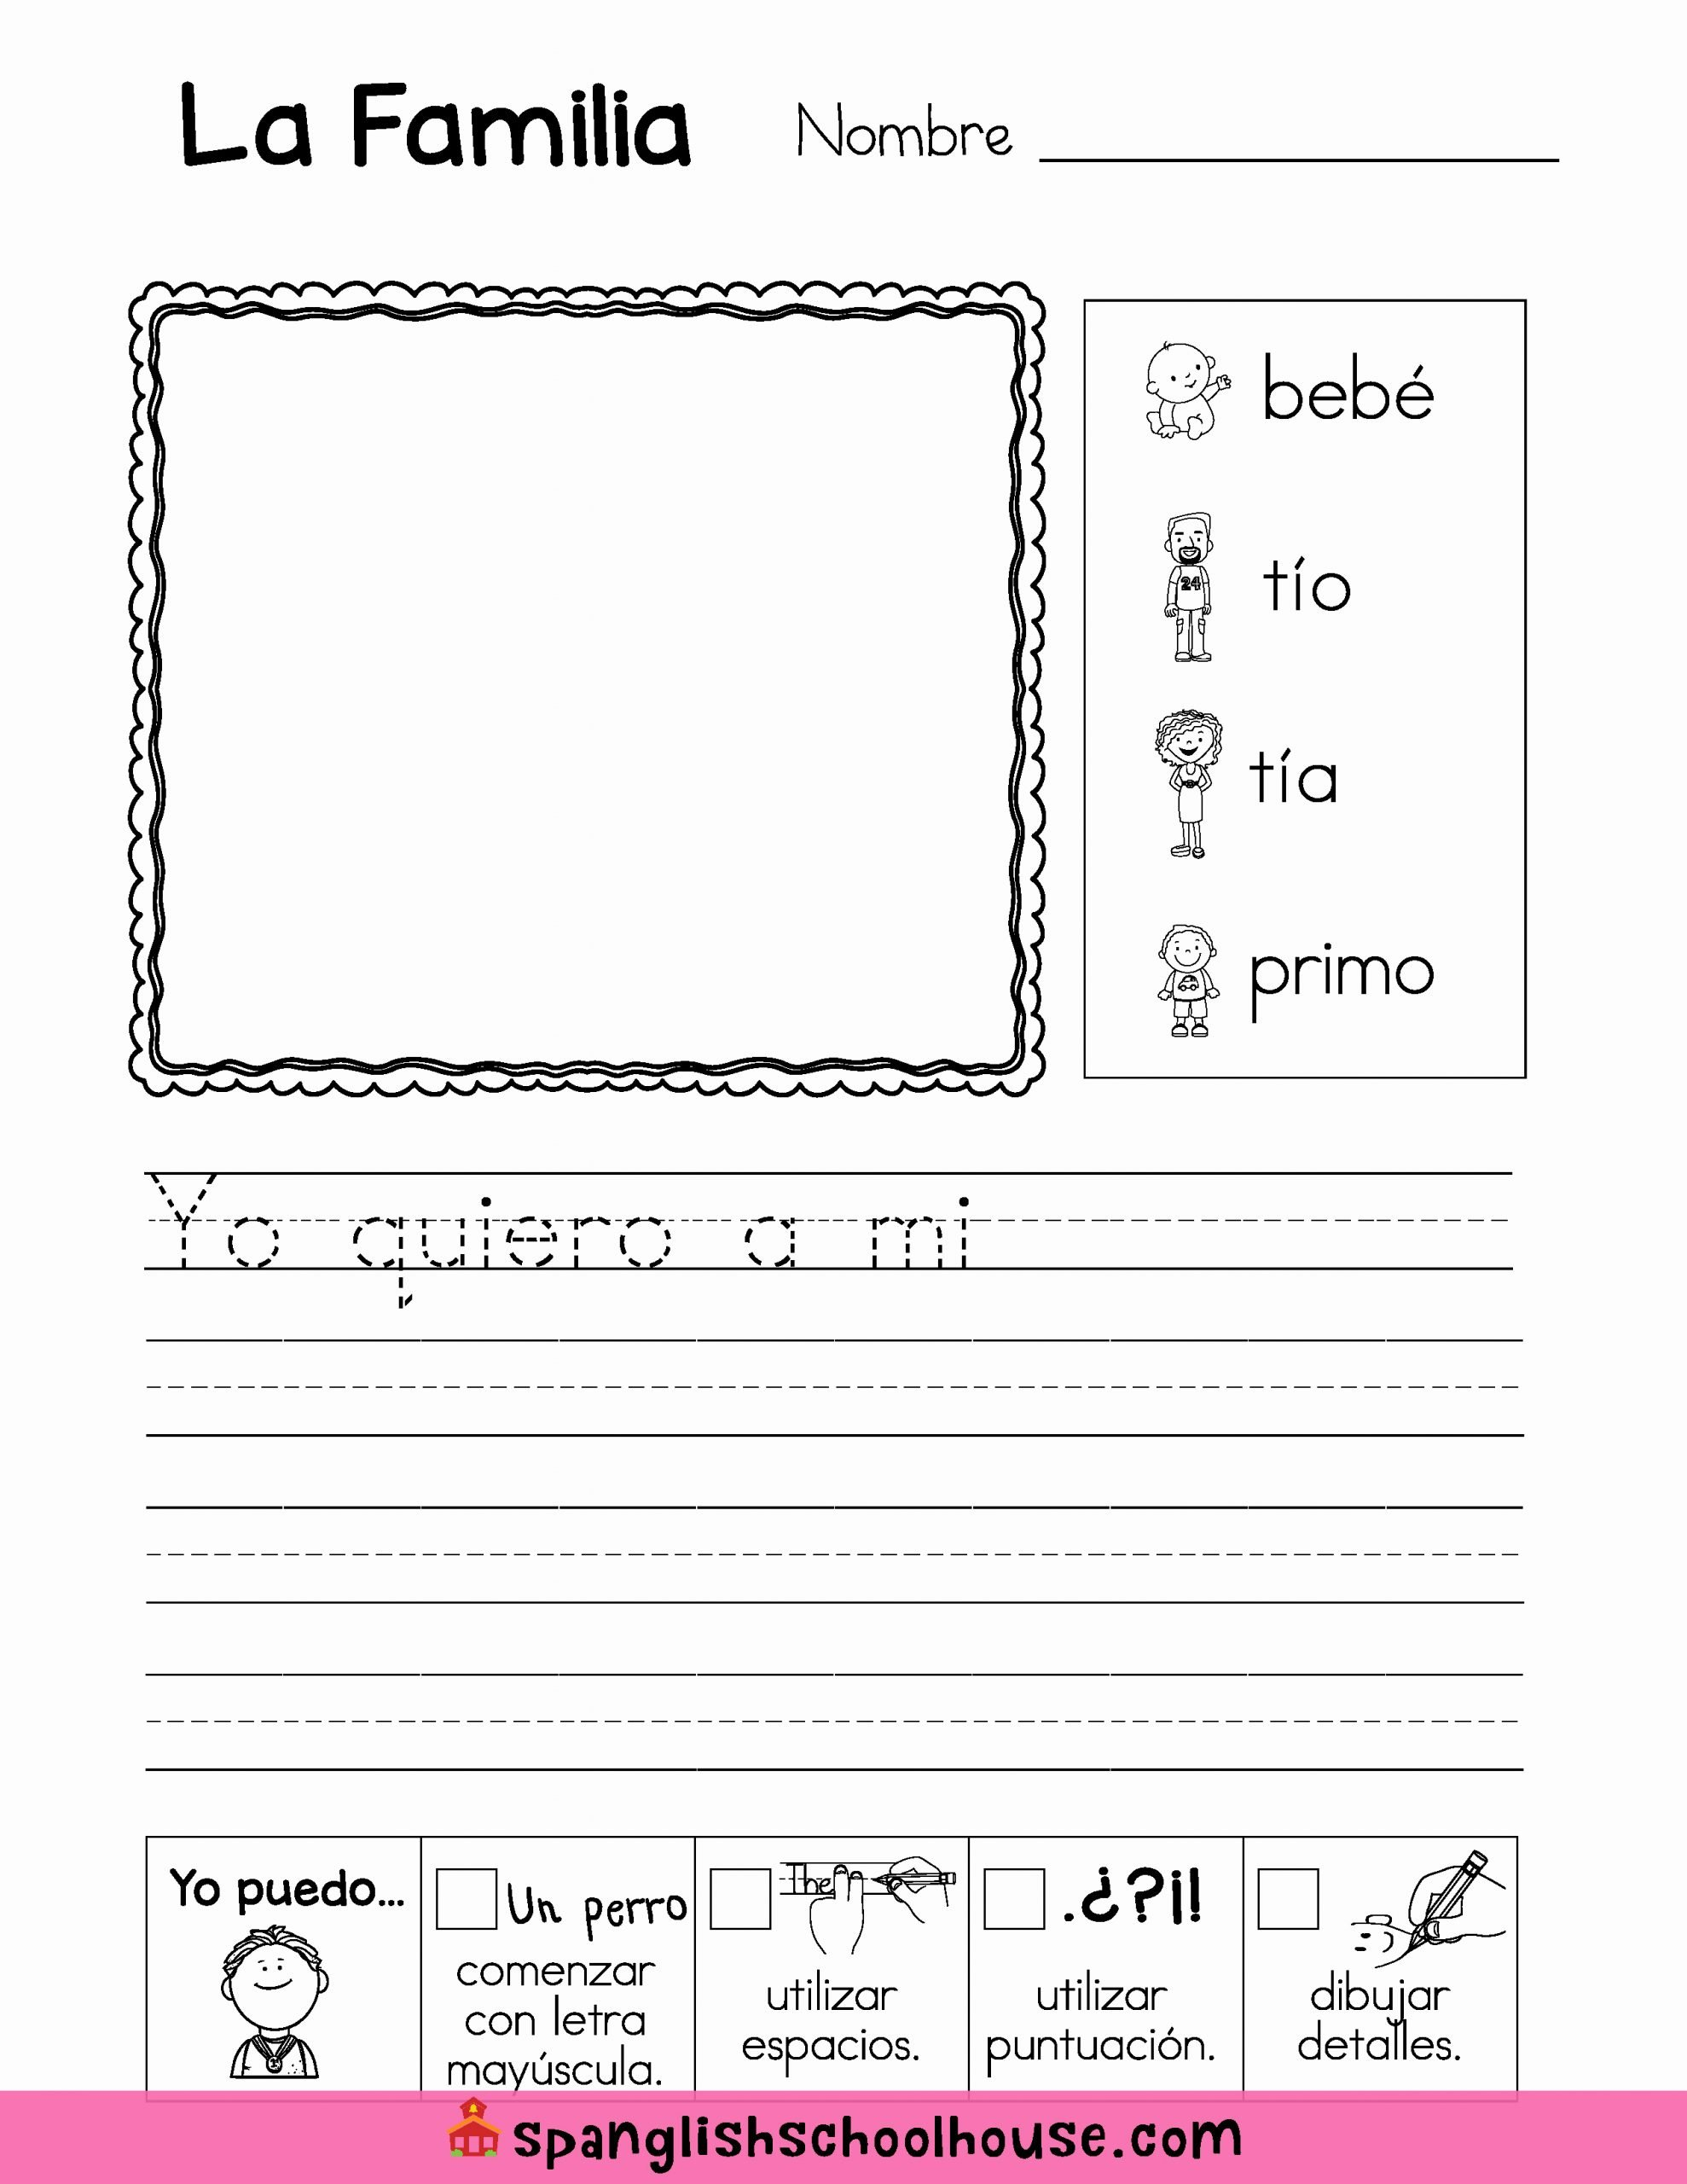 La Familia Worksheet In Spanish Free La Familia Family Vocabulary In Spanish